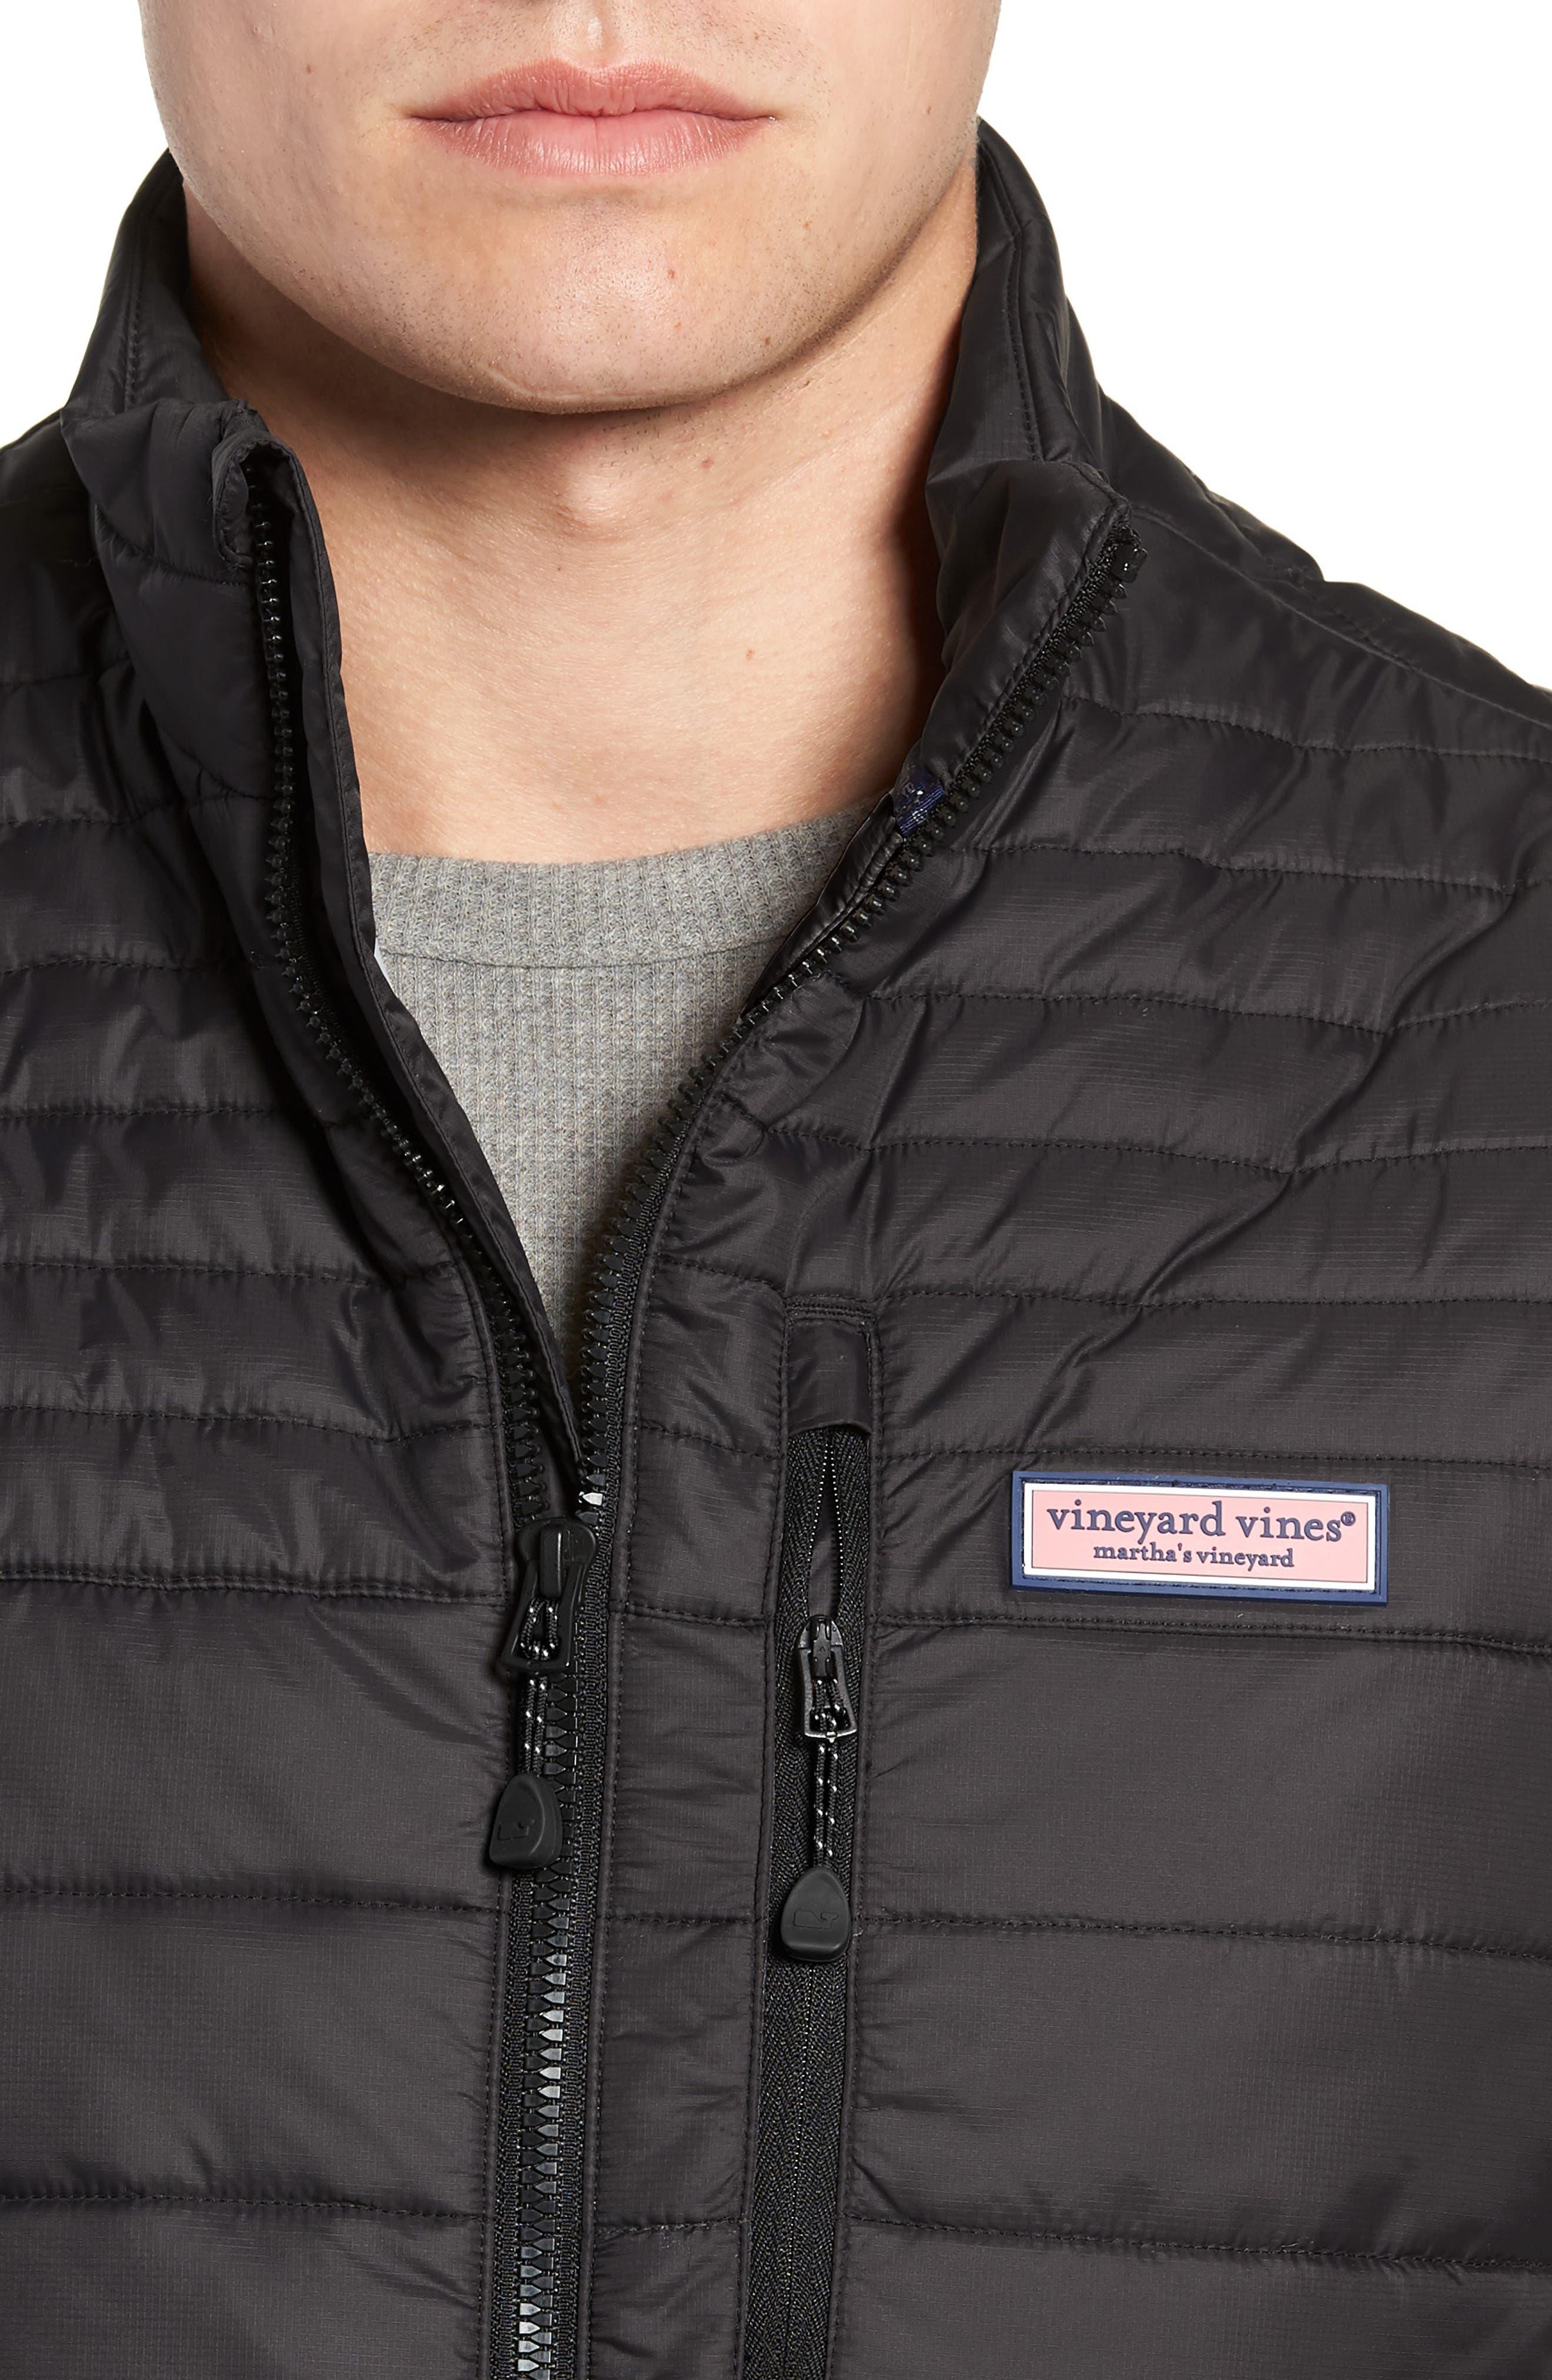 VINEYARD VINES,                             Regular Fit Down Mountain Vest,                             Alternate thumbnail 4, color,                             002